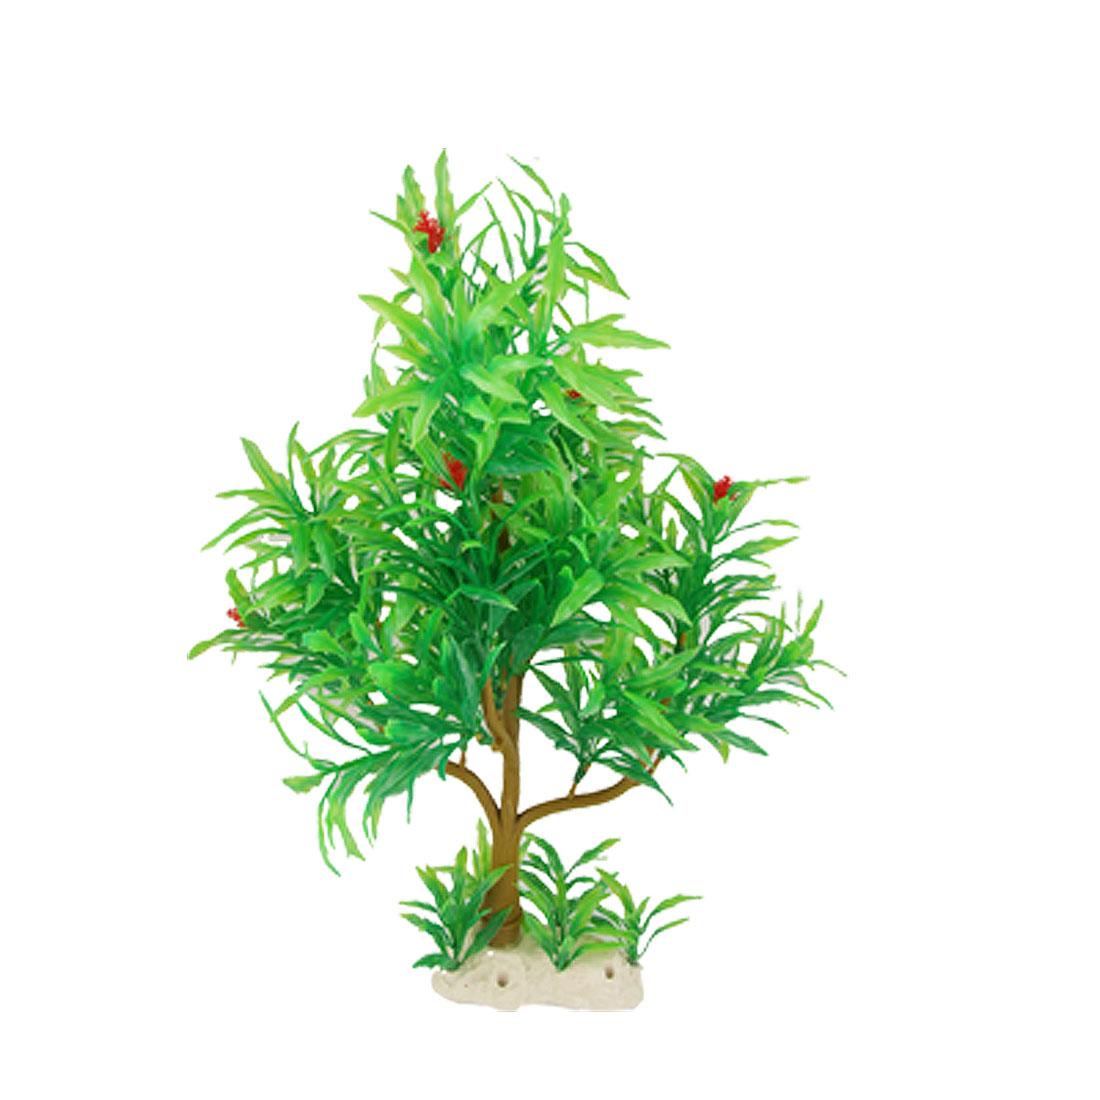 Fish Tank Aquarium Plastic Tree Plant Ornament Green